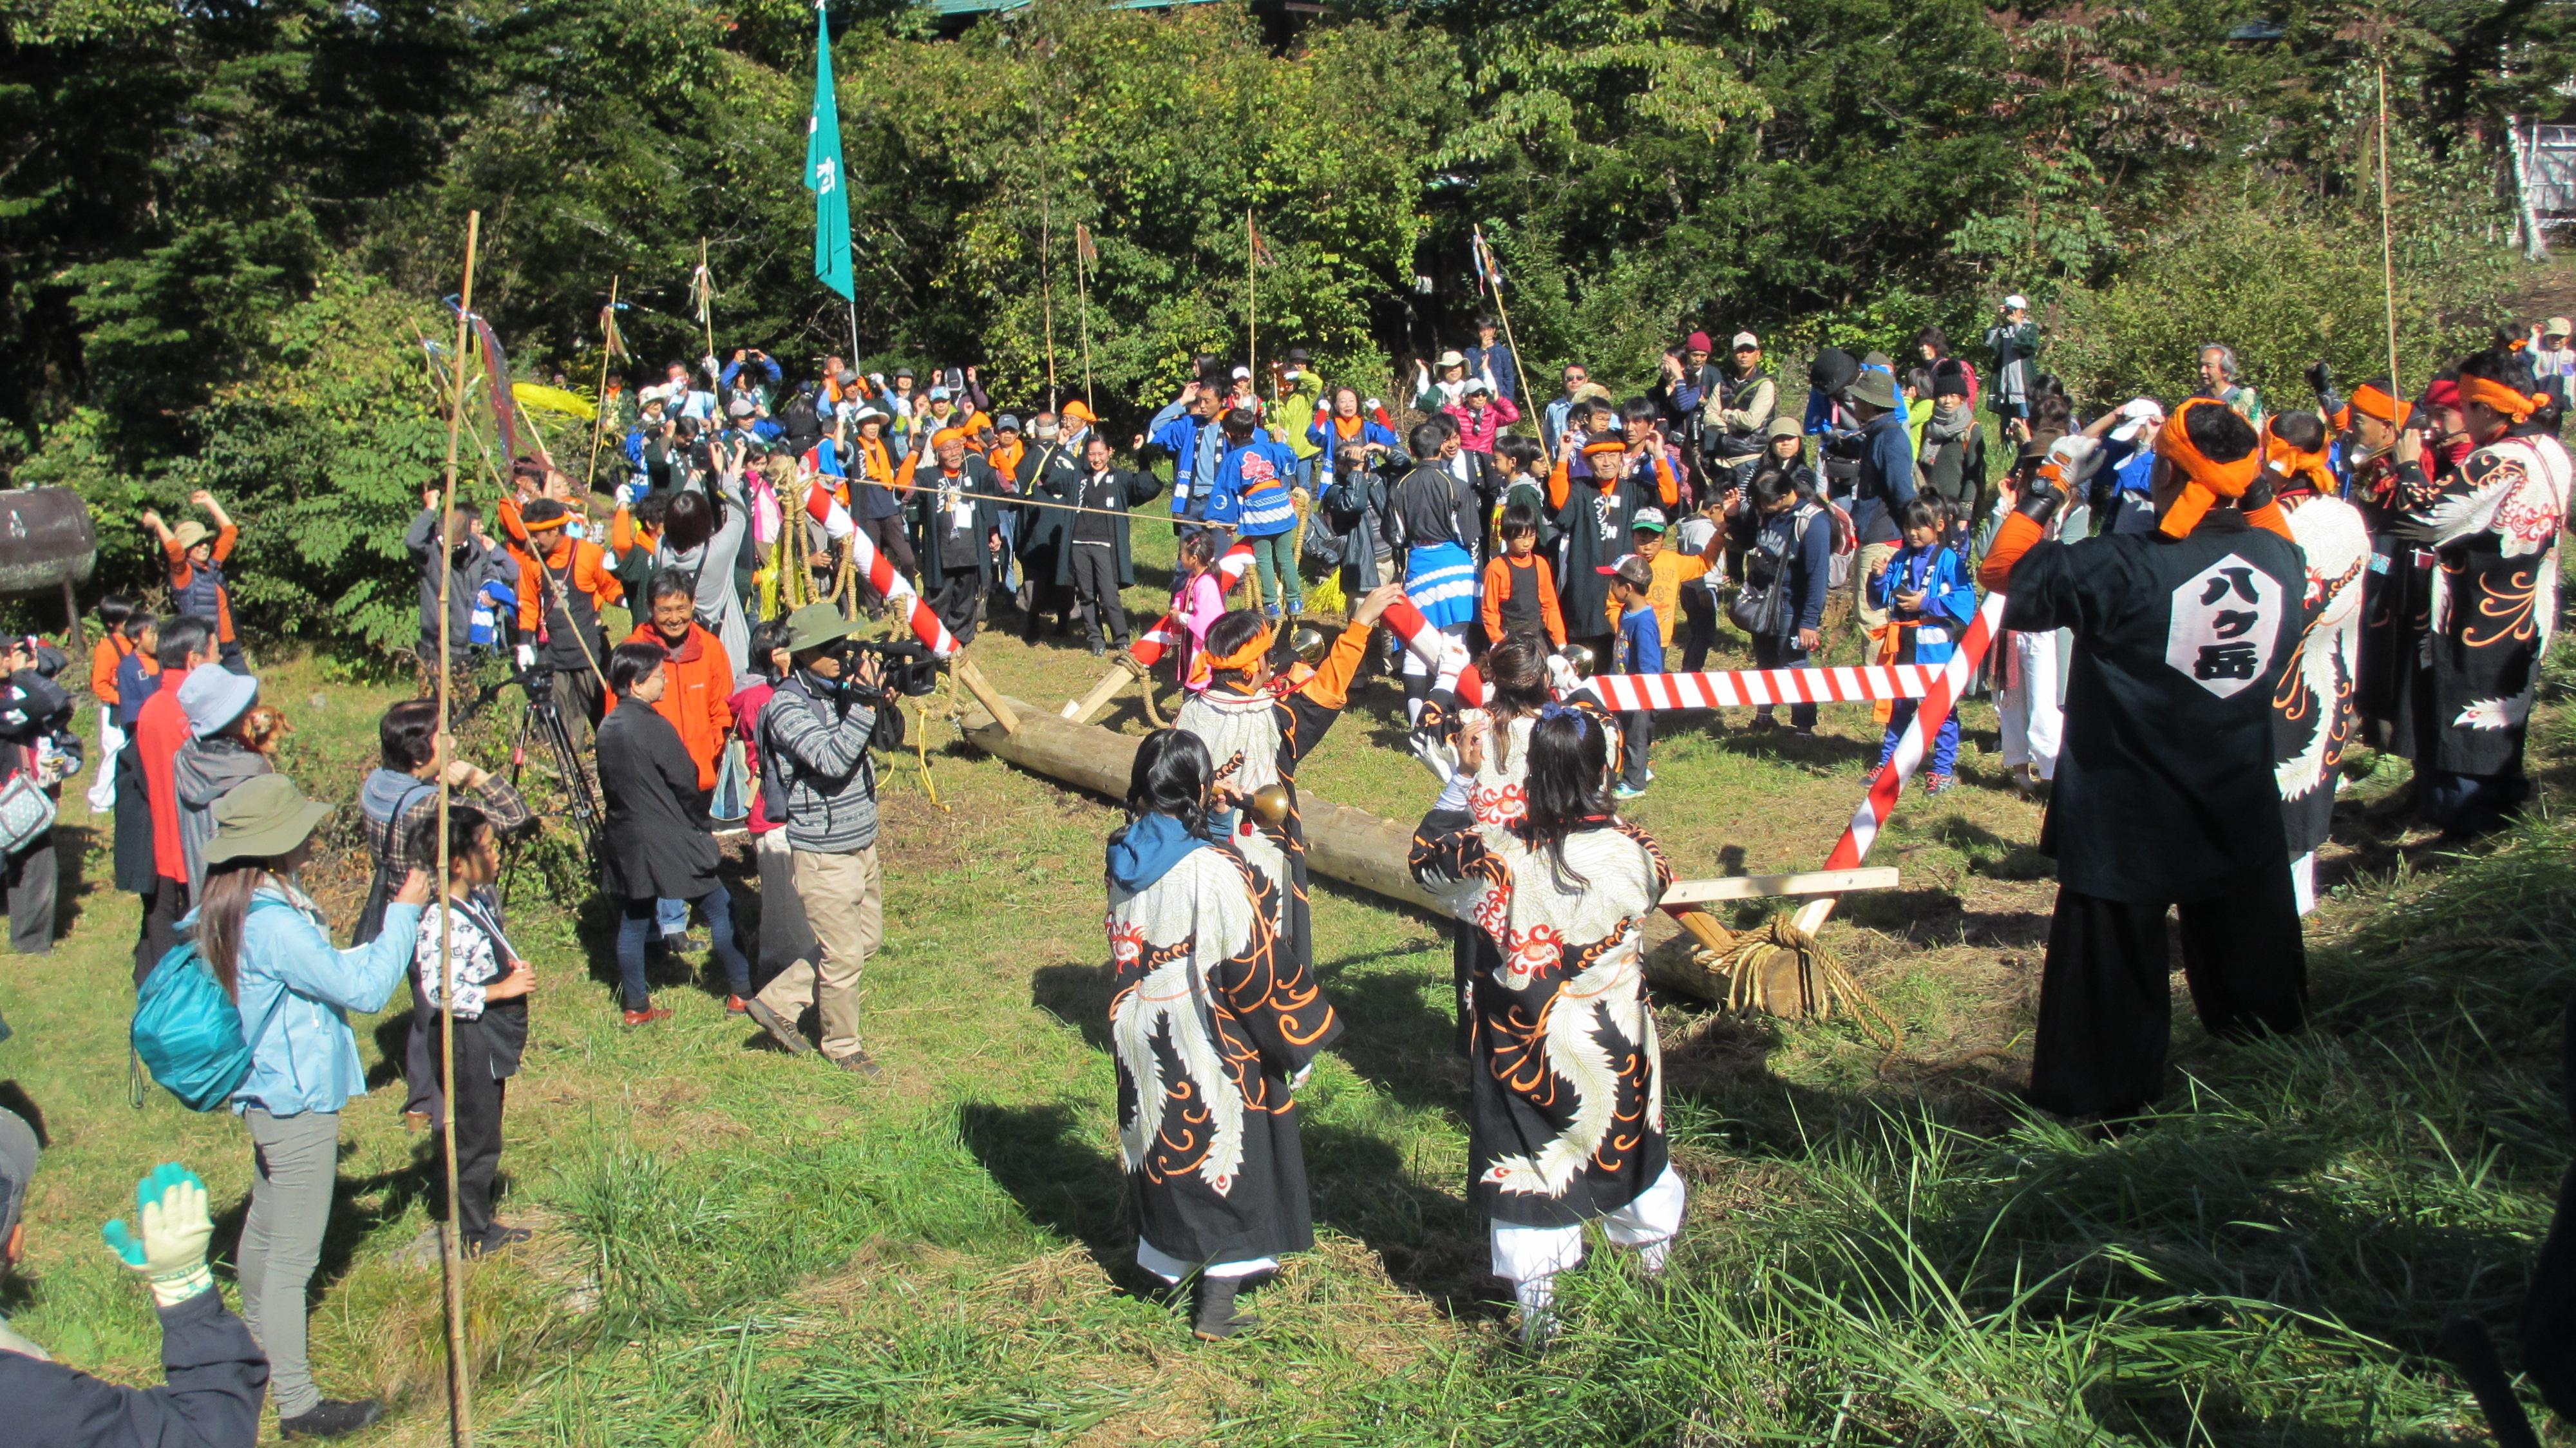 http://www.alpico.co.jp/shikinomori/news/images/IMG_6812.JPG